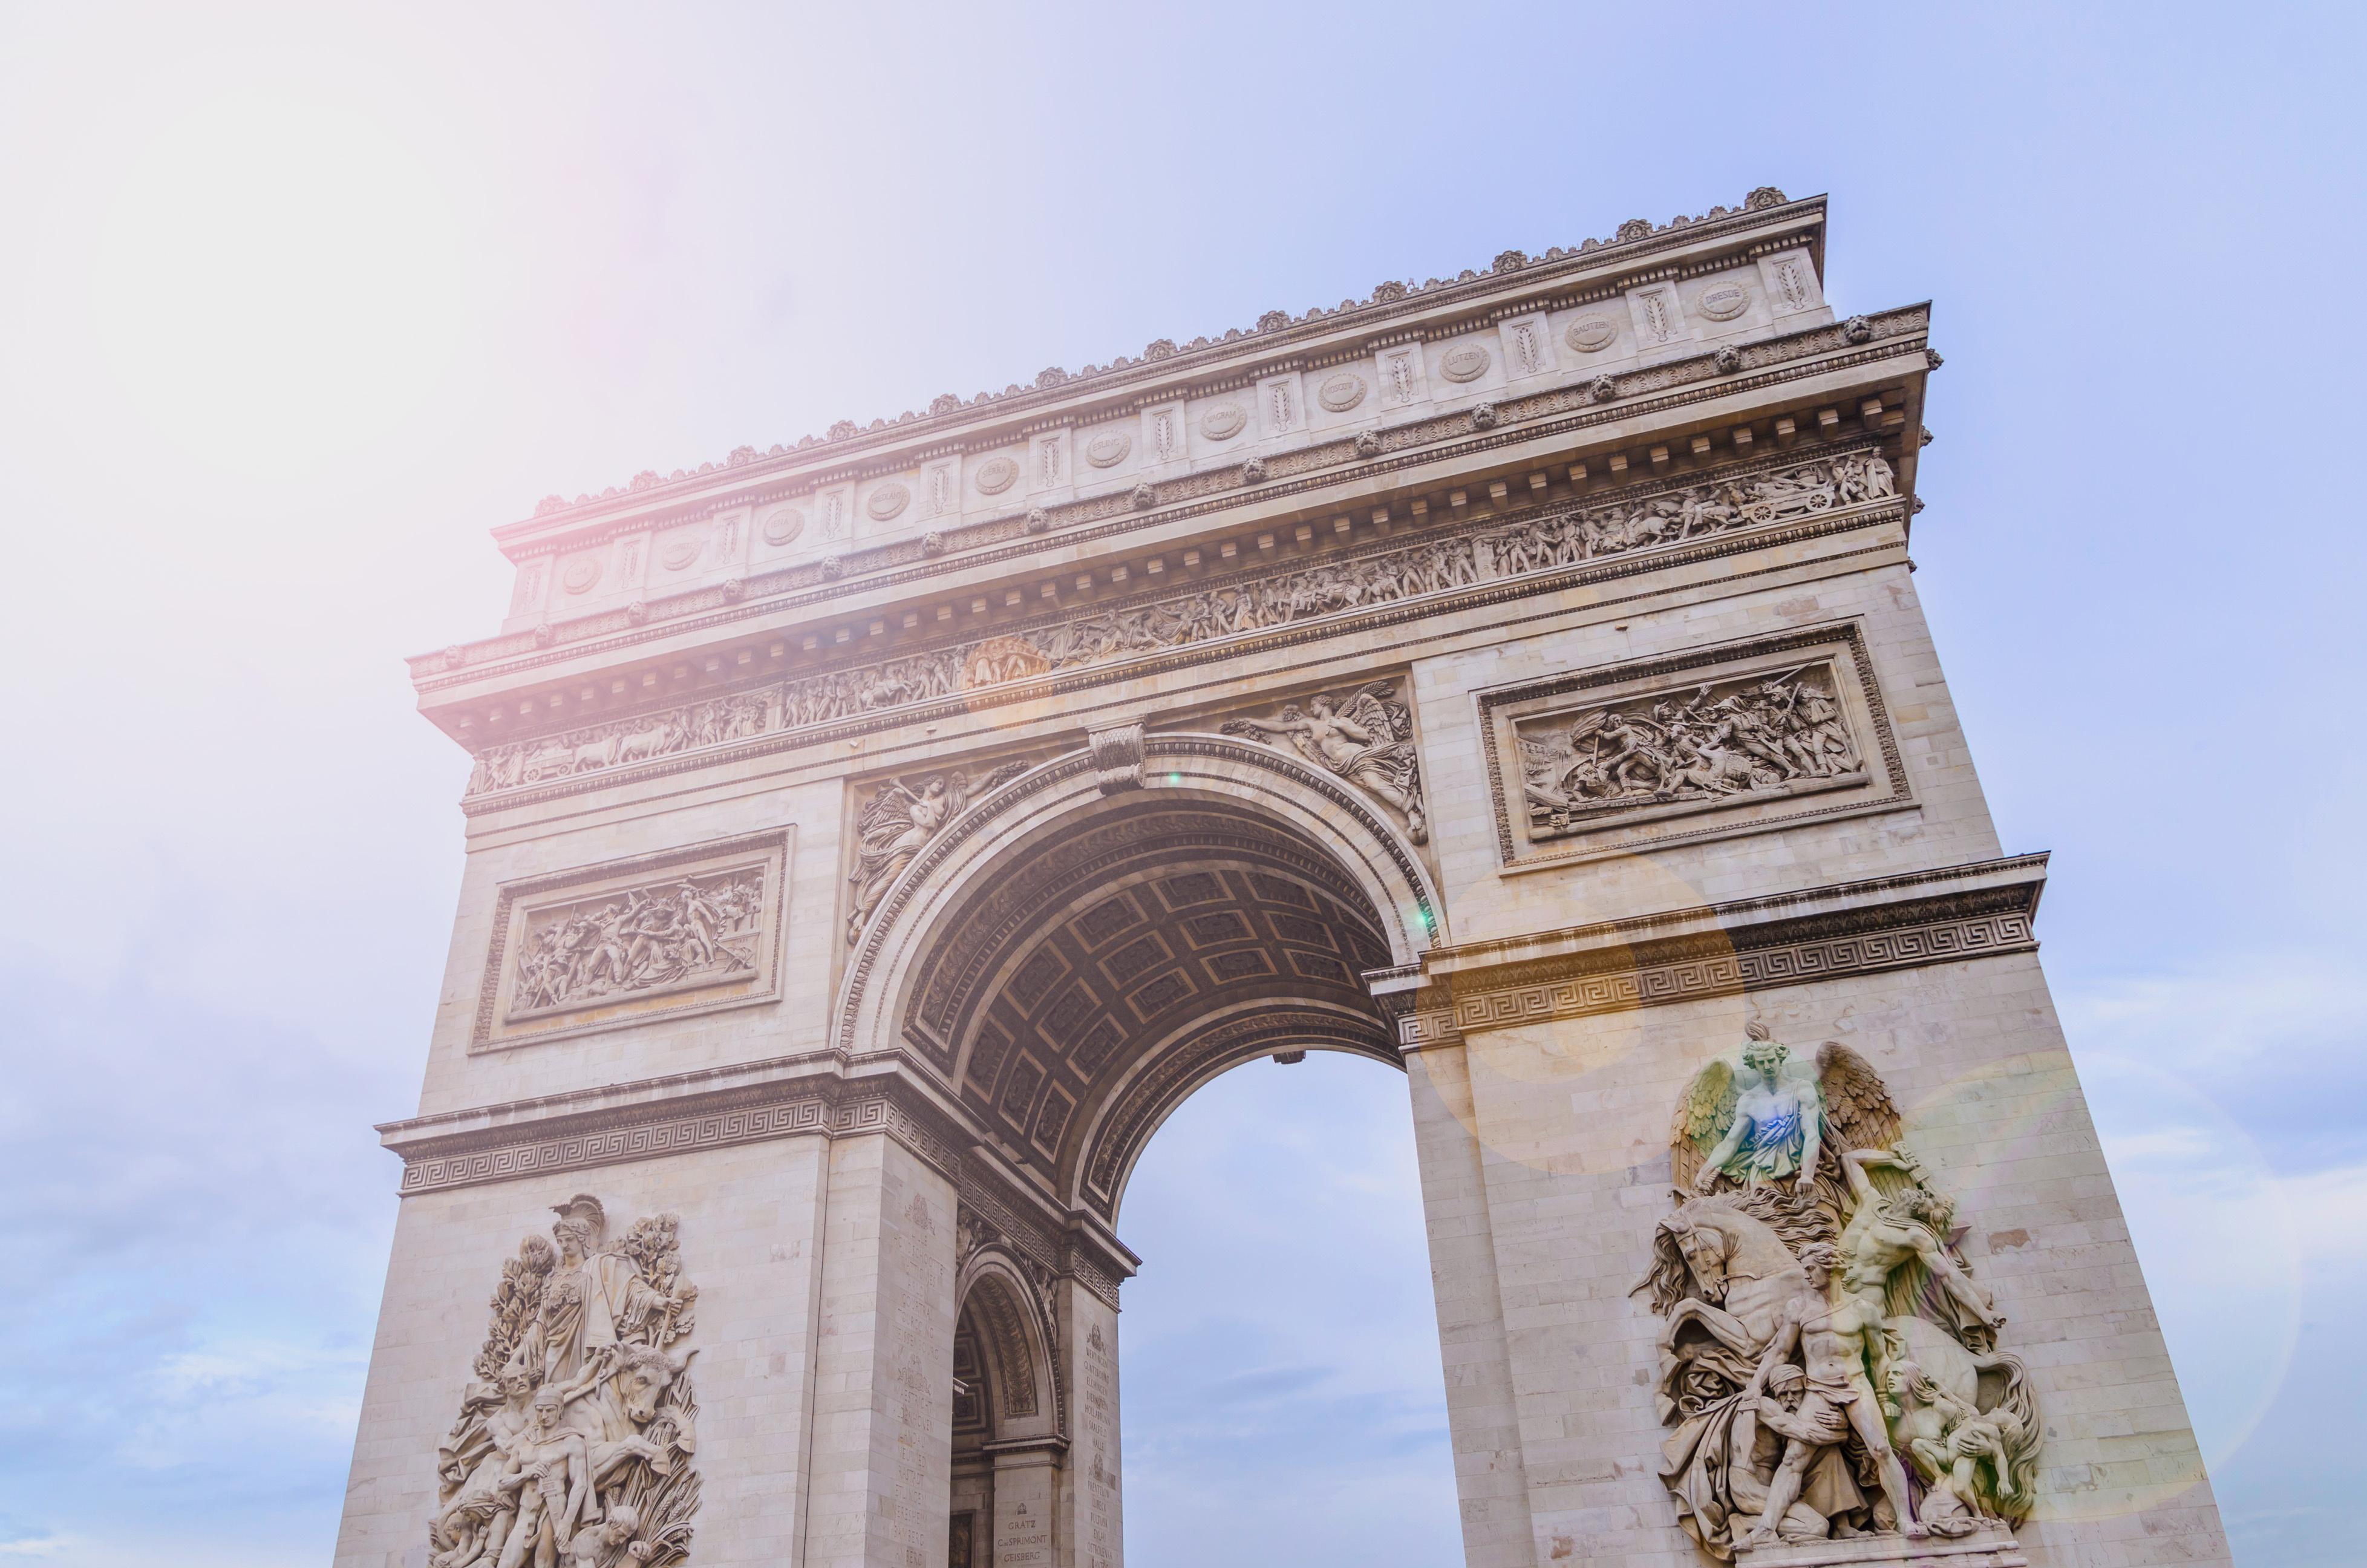 Chateaux-France triomphe